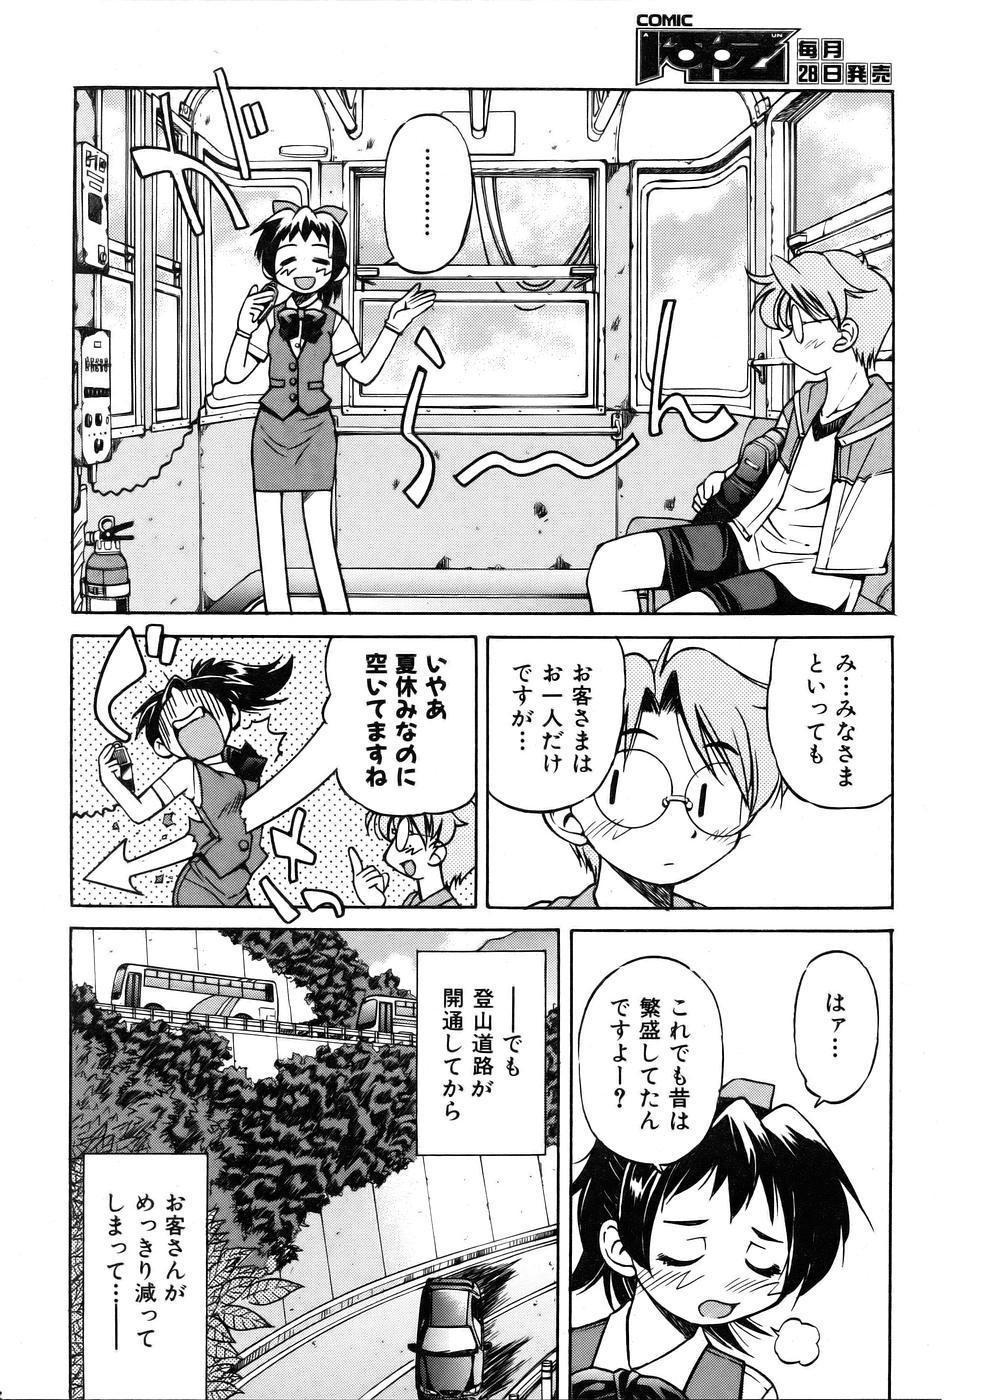 COMIC AUN 2005-10 Vol. 113 205